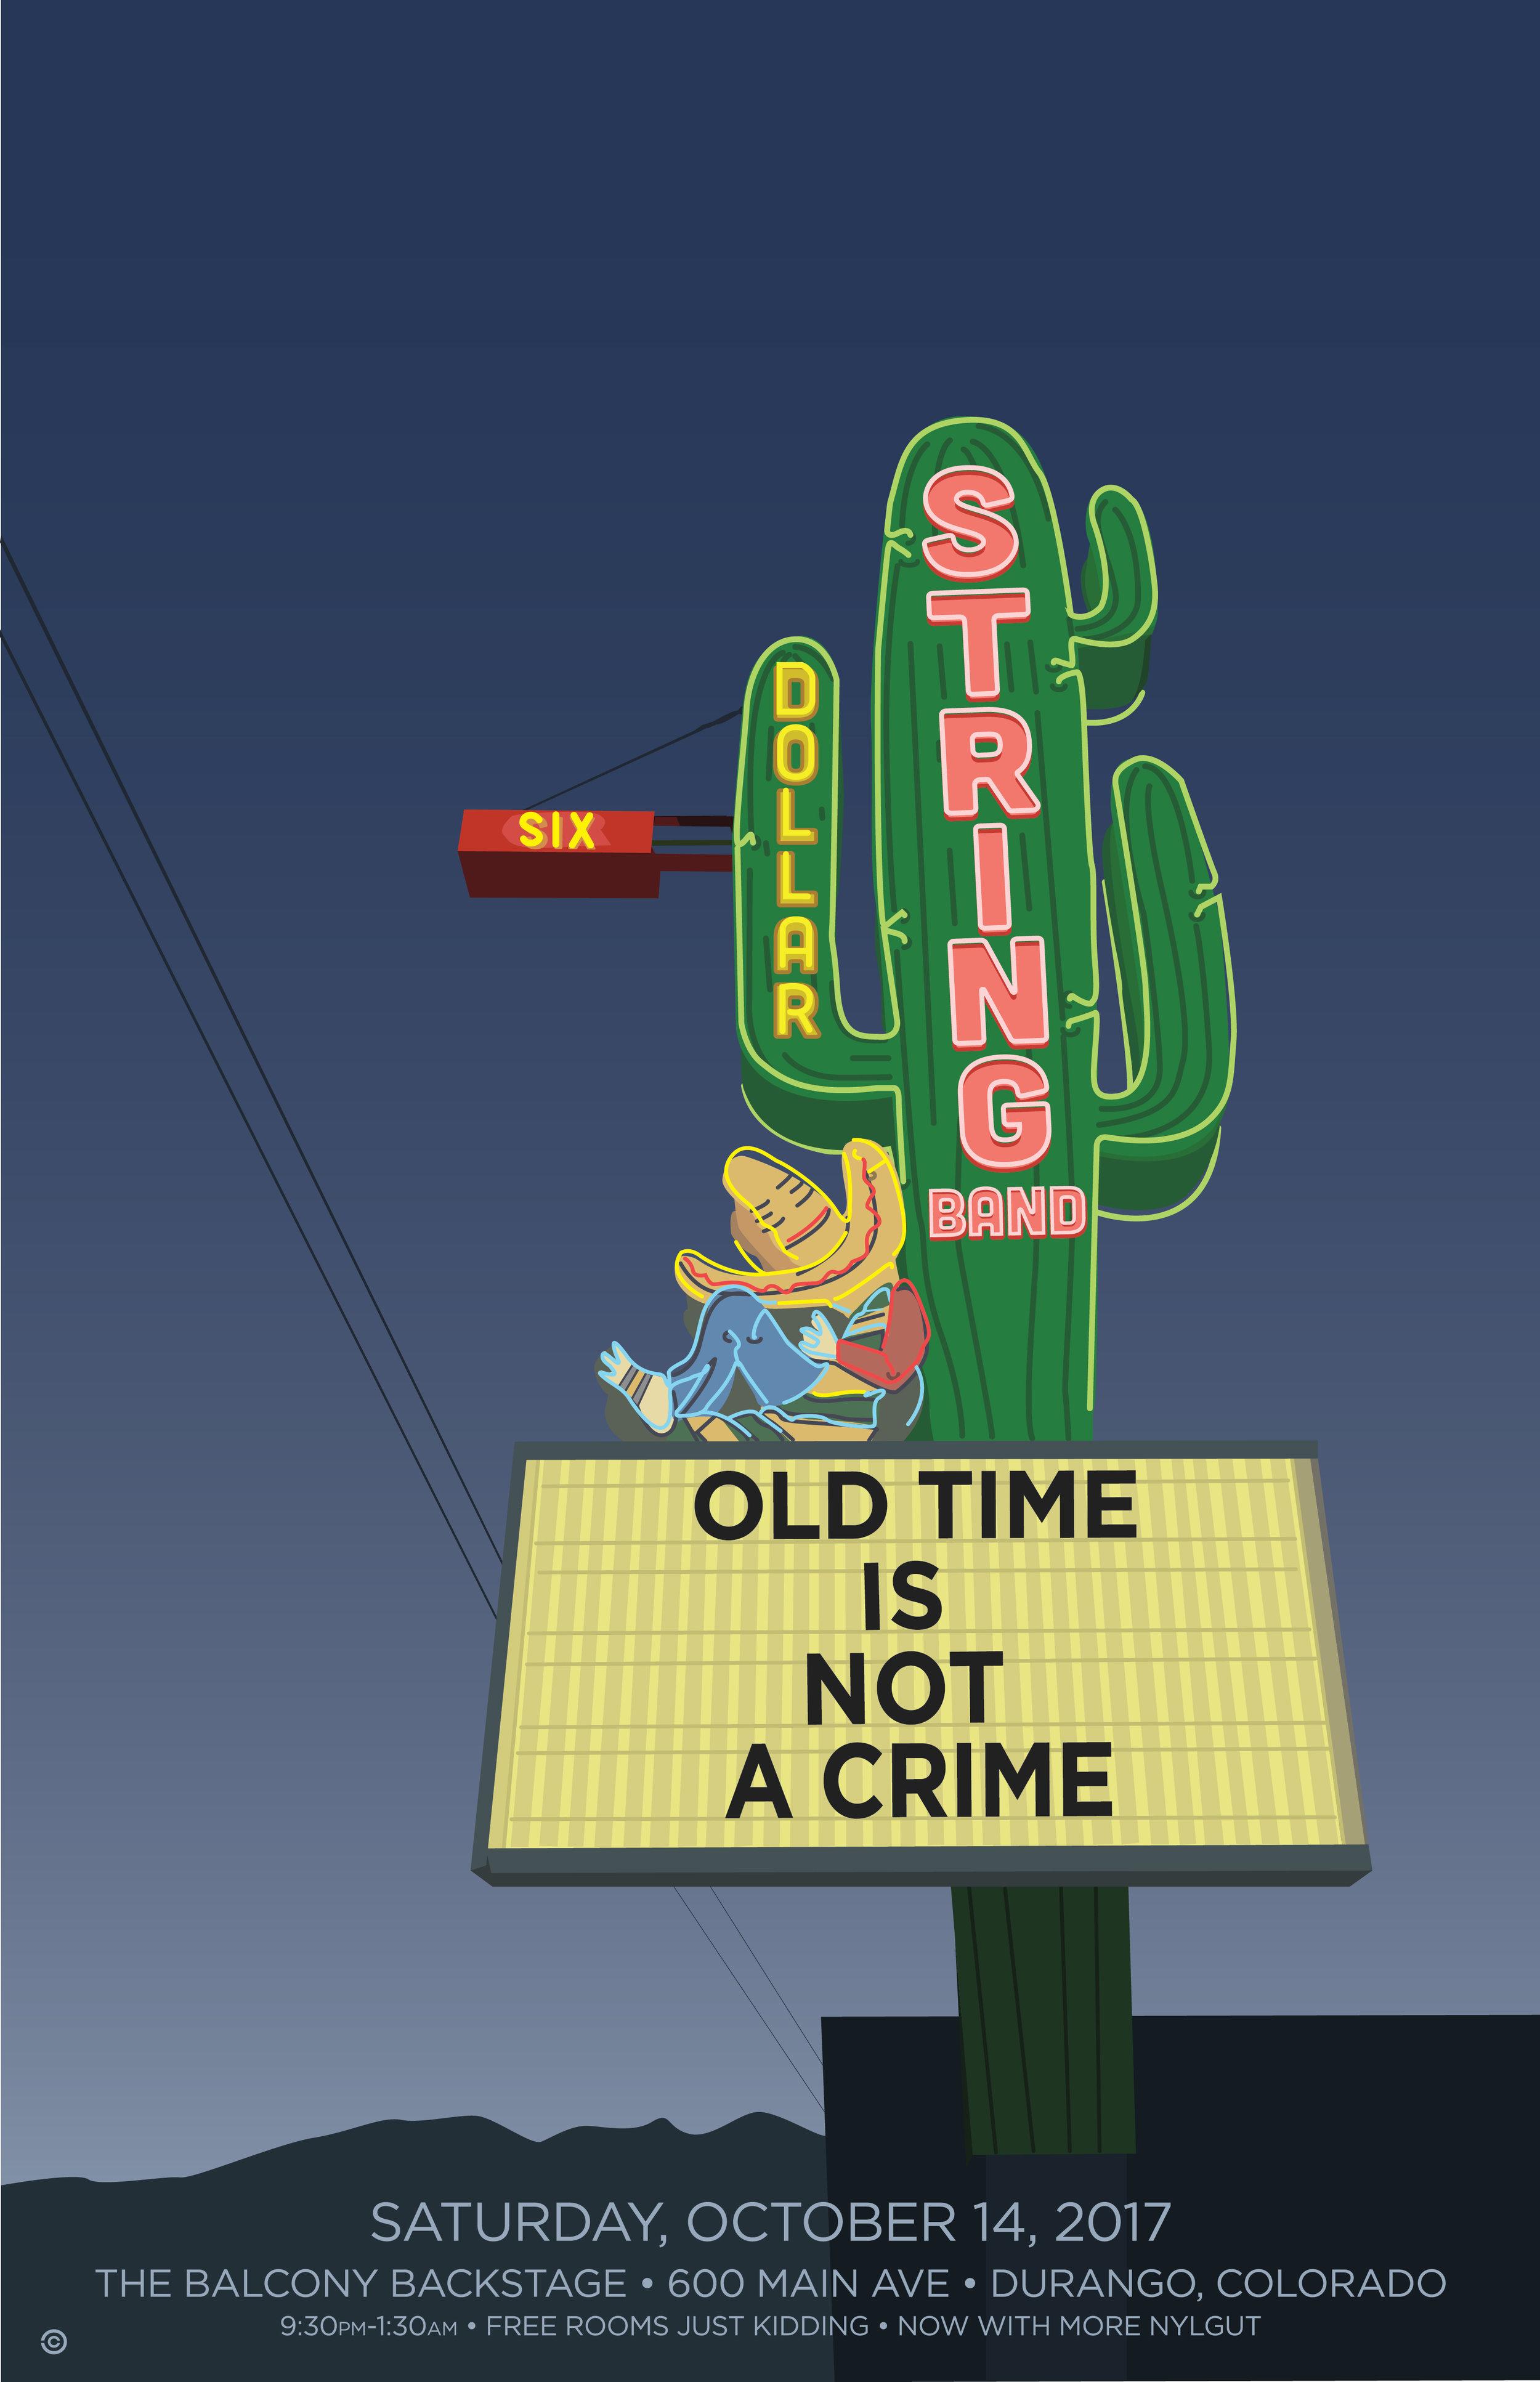 Neon Cactus - Six Dollar String Band